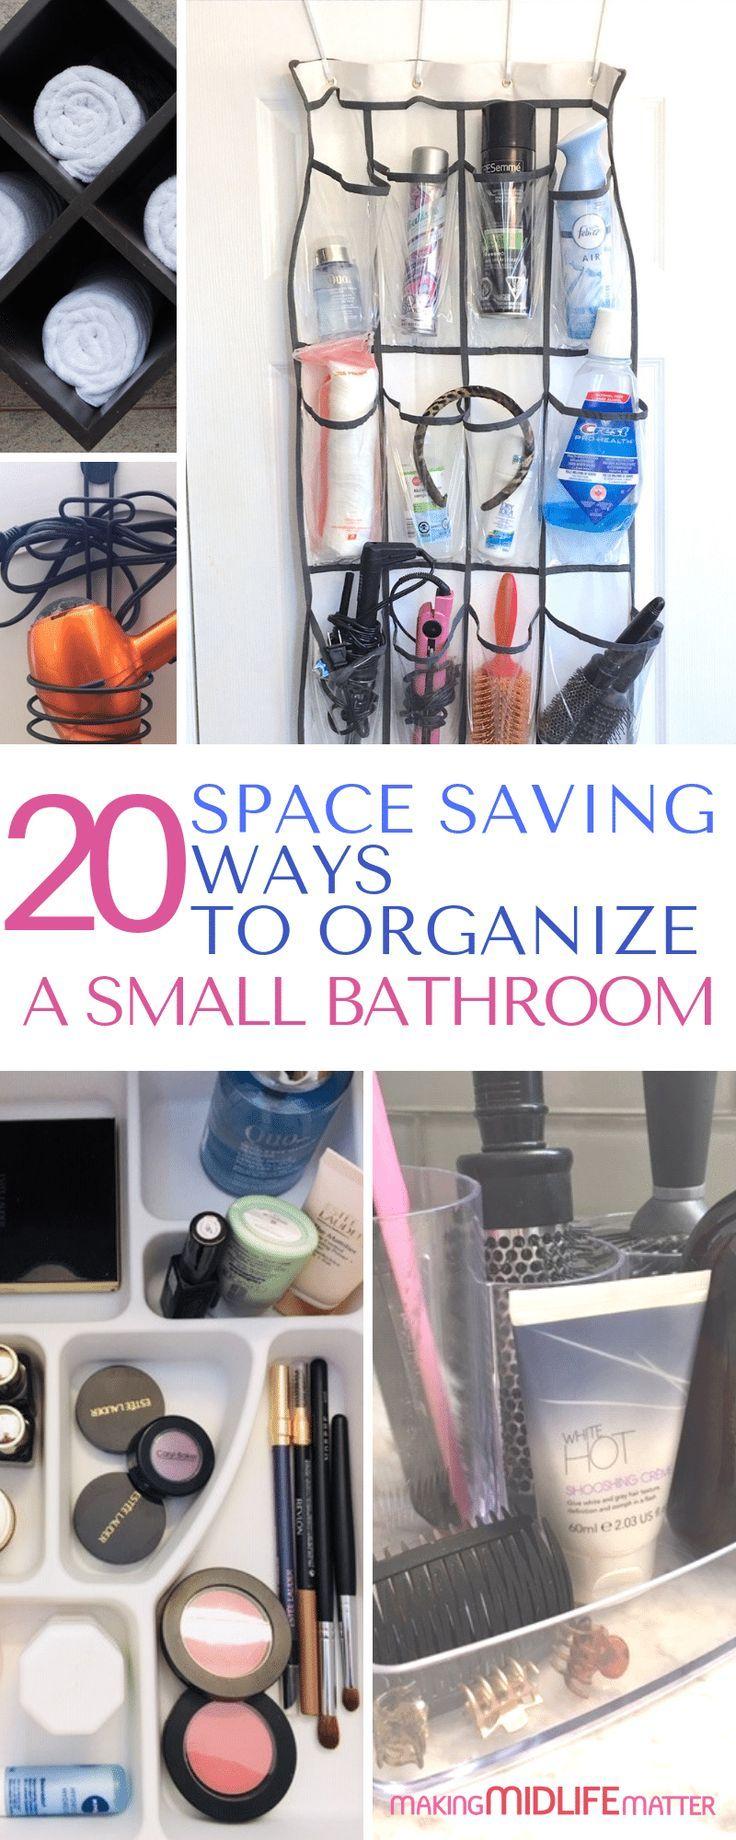 20 Space Saving Ways to Organize a Small Bathroom | Small ...